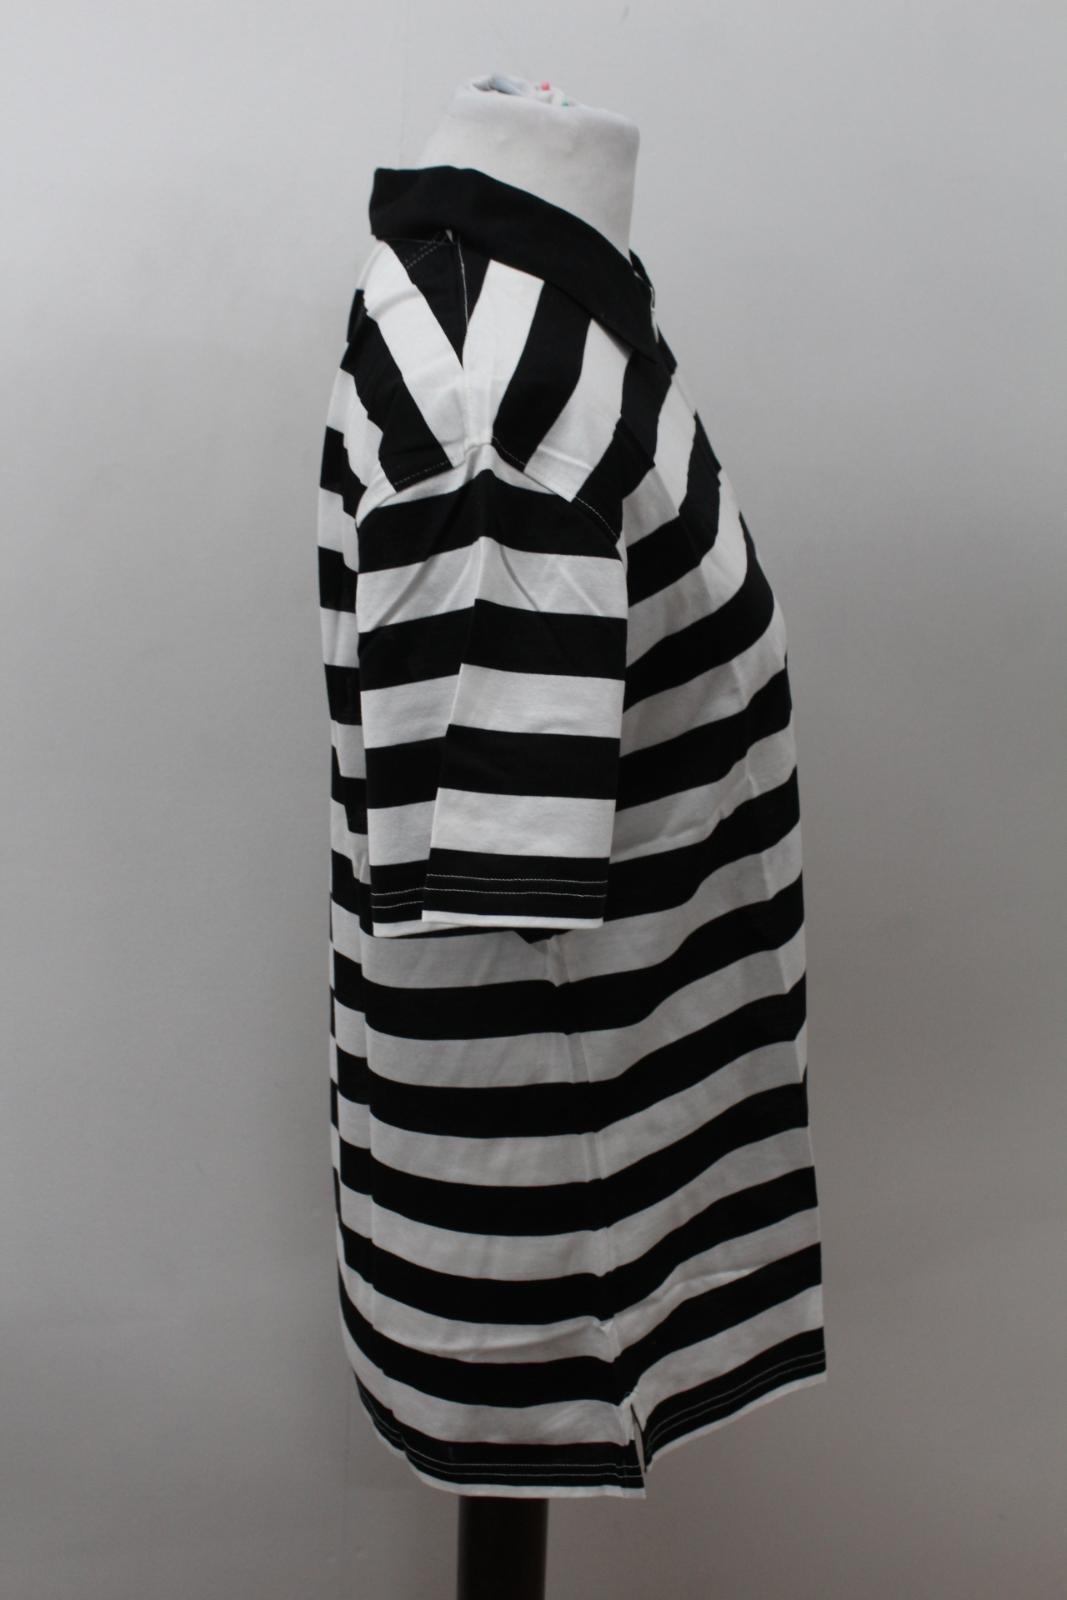 BURBERRY-GOLF-Ladies-Black-White-Cotton-Short-Sleeve-Striped-Polo-Shirt-S-BNWT thumbnail 4